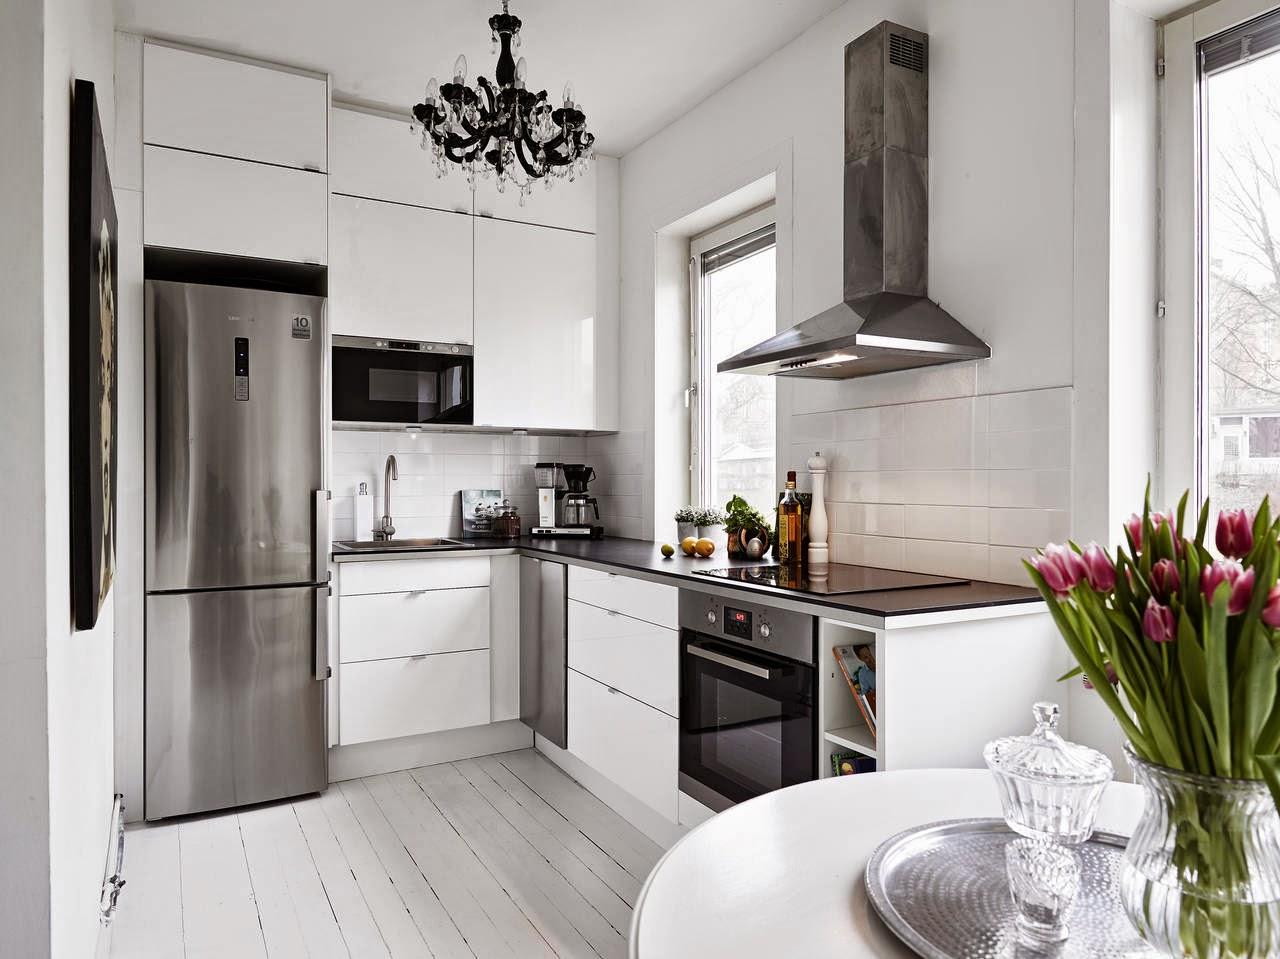 ideas-deco-cocinas-abiertas-espacios-pequenos-cocina-americana-sorteo-cocinasrio